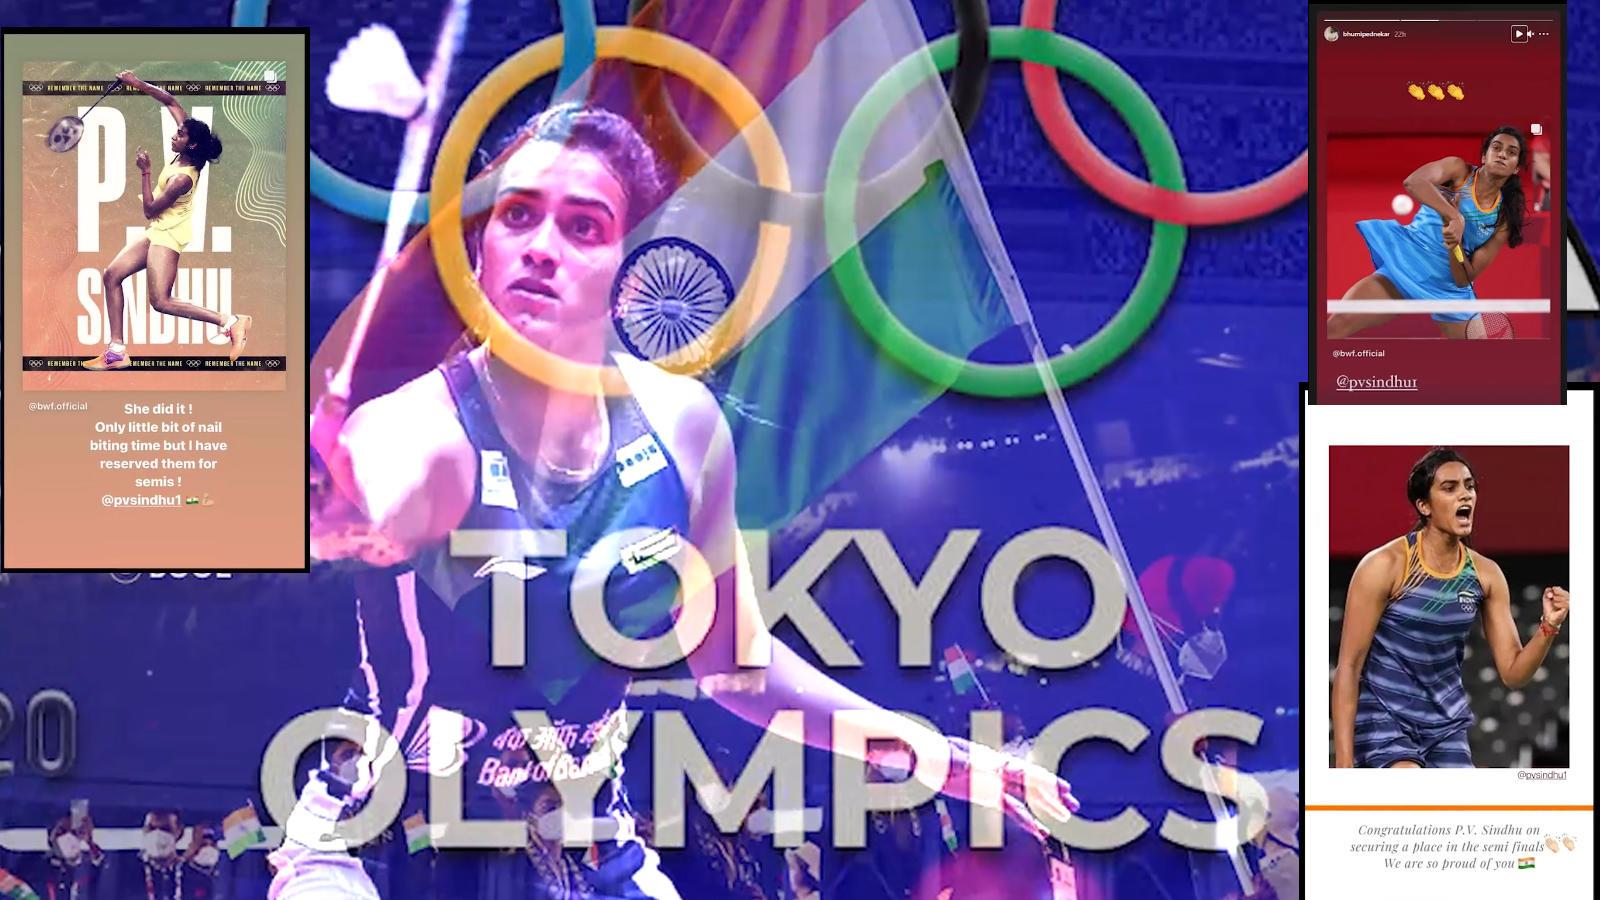 tokyo-olympics-anushka-sharma-arjun-kapoor-and-other-bollywood-celebs-hail-pv-sindhu-as-she-storms-into-semi-finals